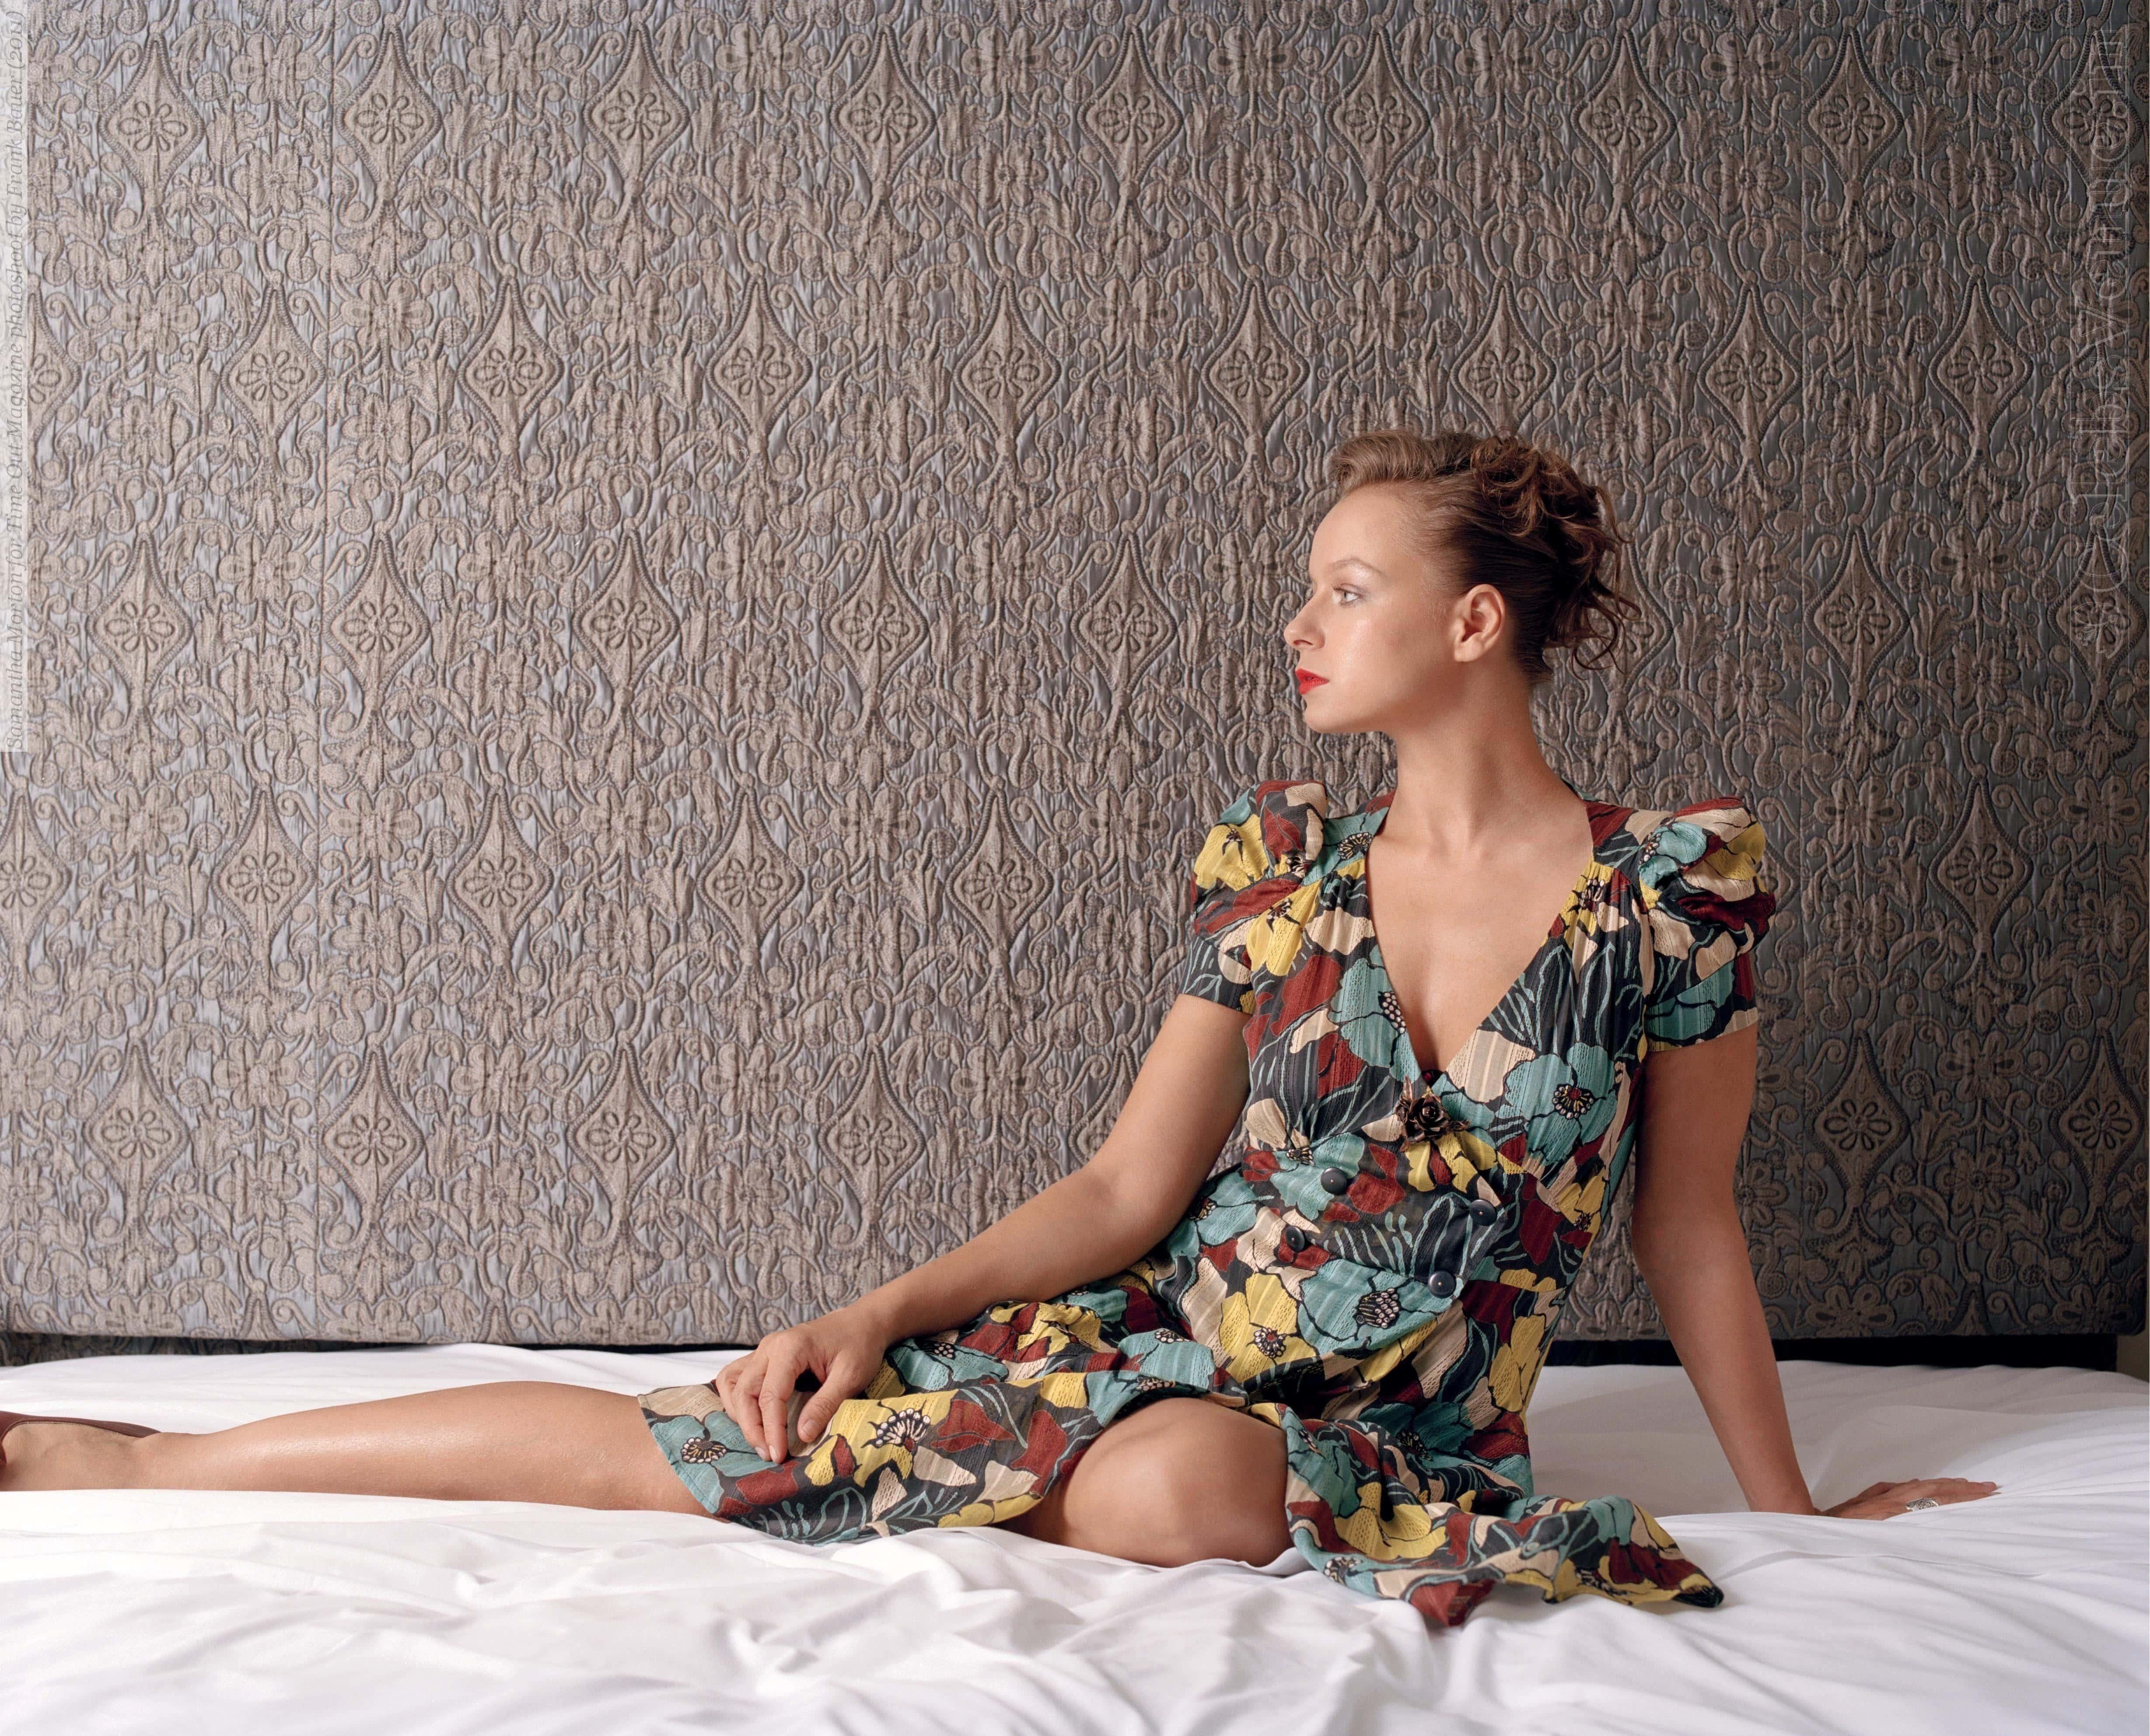 Milana Vayntrub,Lotus Thompson Adult pic Bessie Barriscale,Lee Meredith